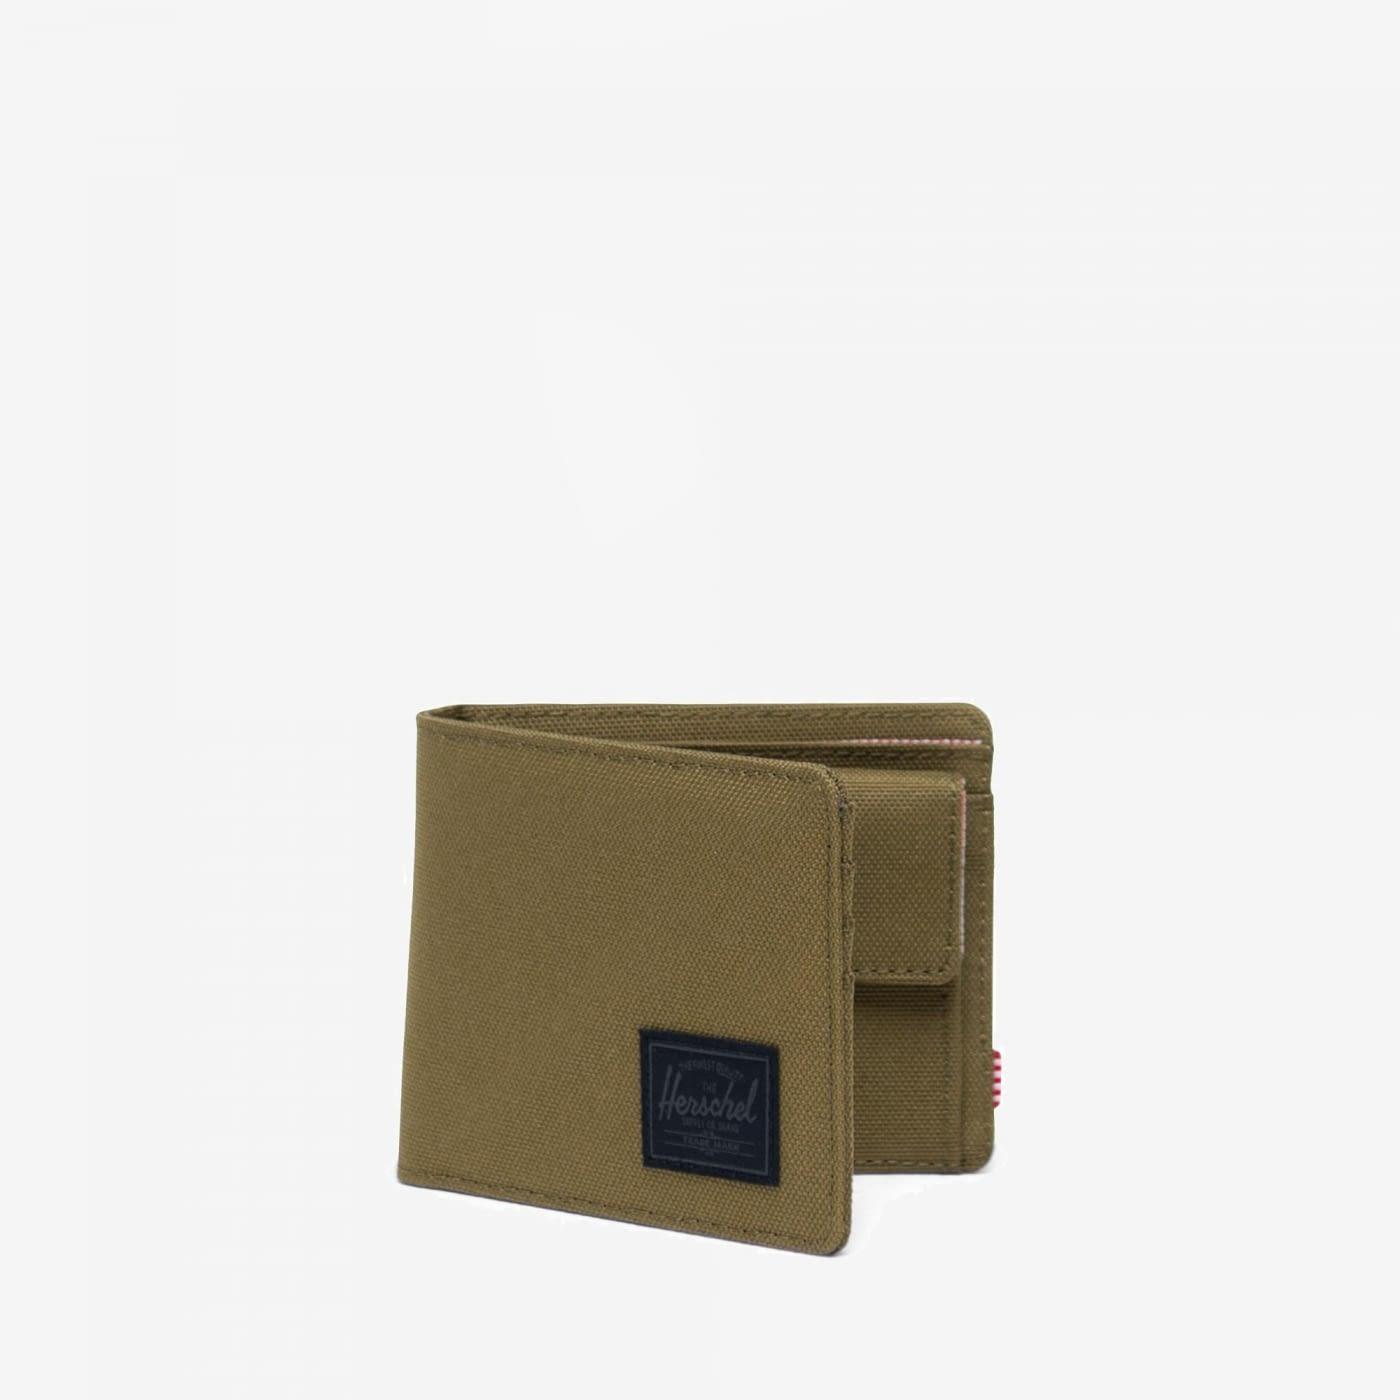 Roy wallet coin